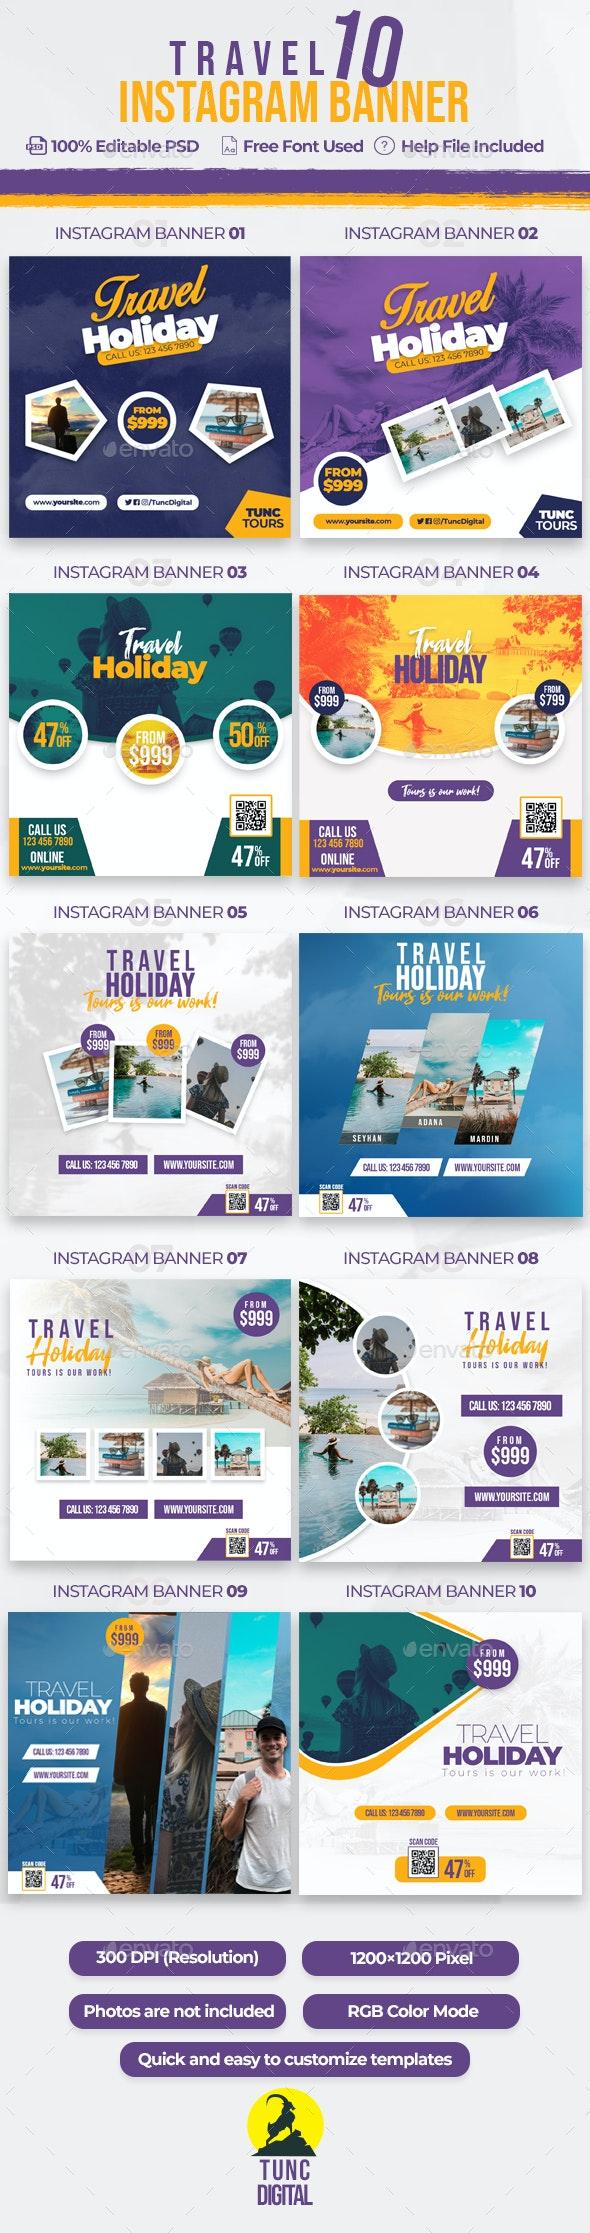 Travel 10 Instagram Banner - Social Media Web Elements